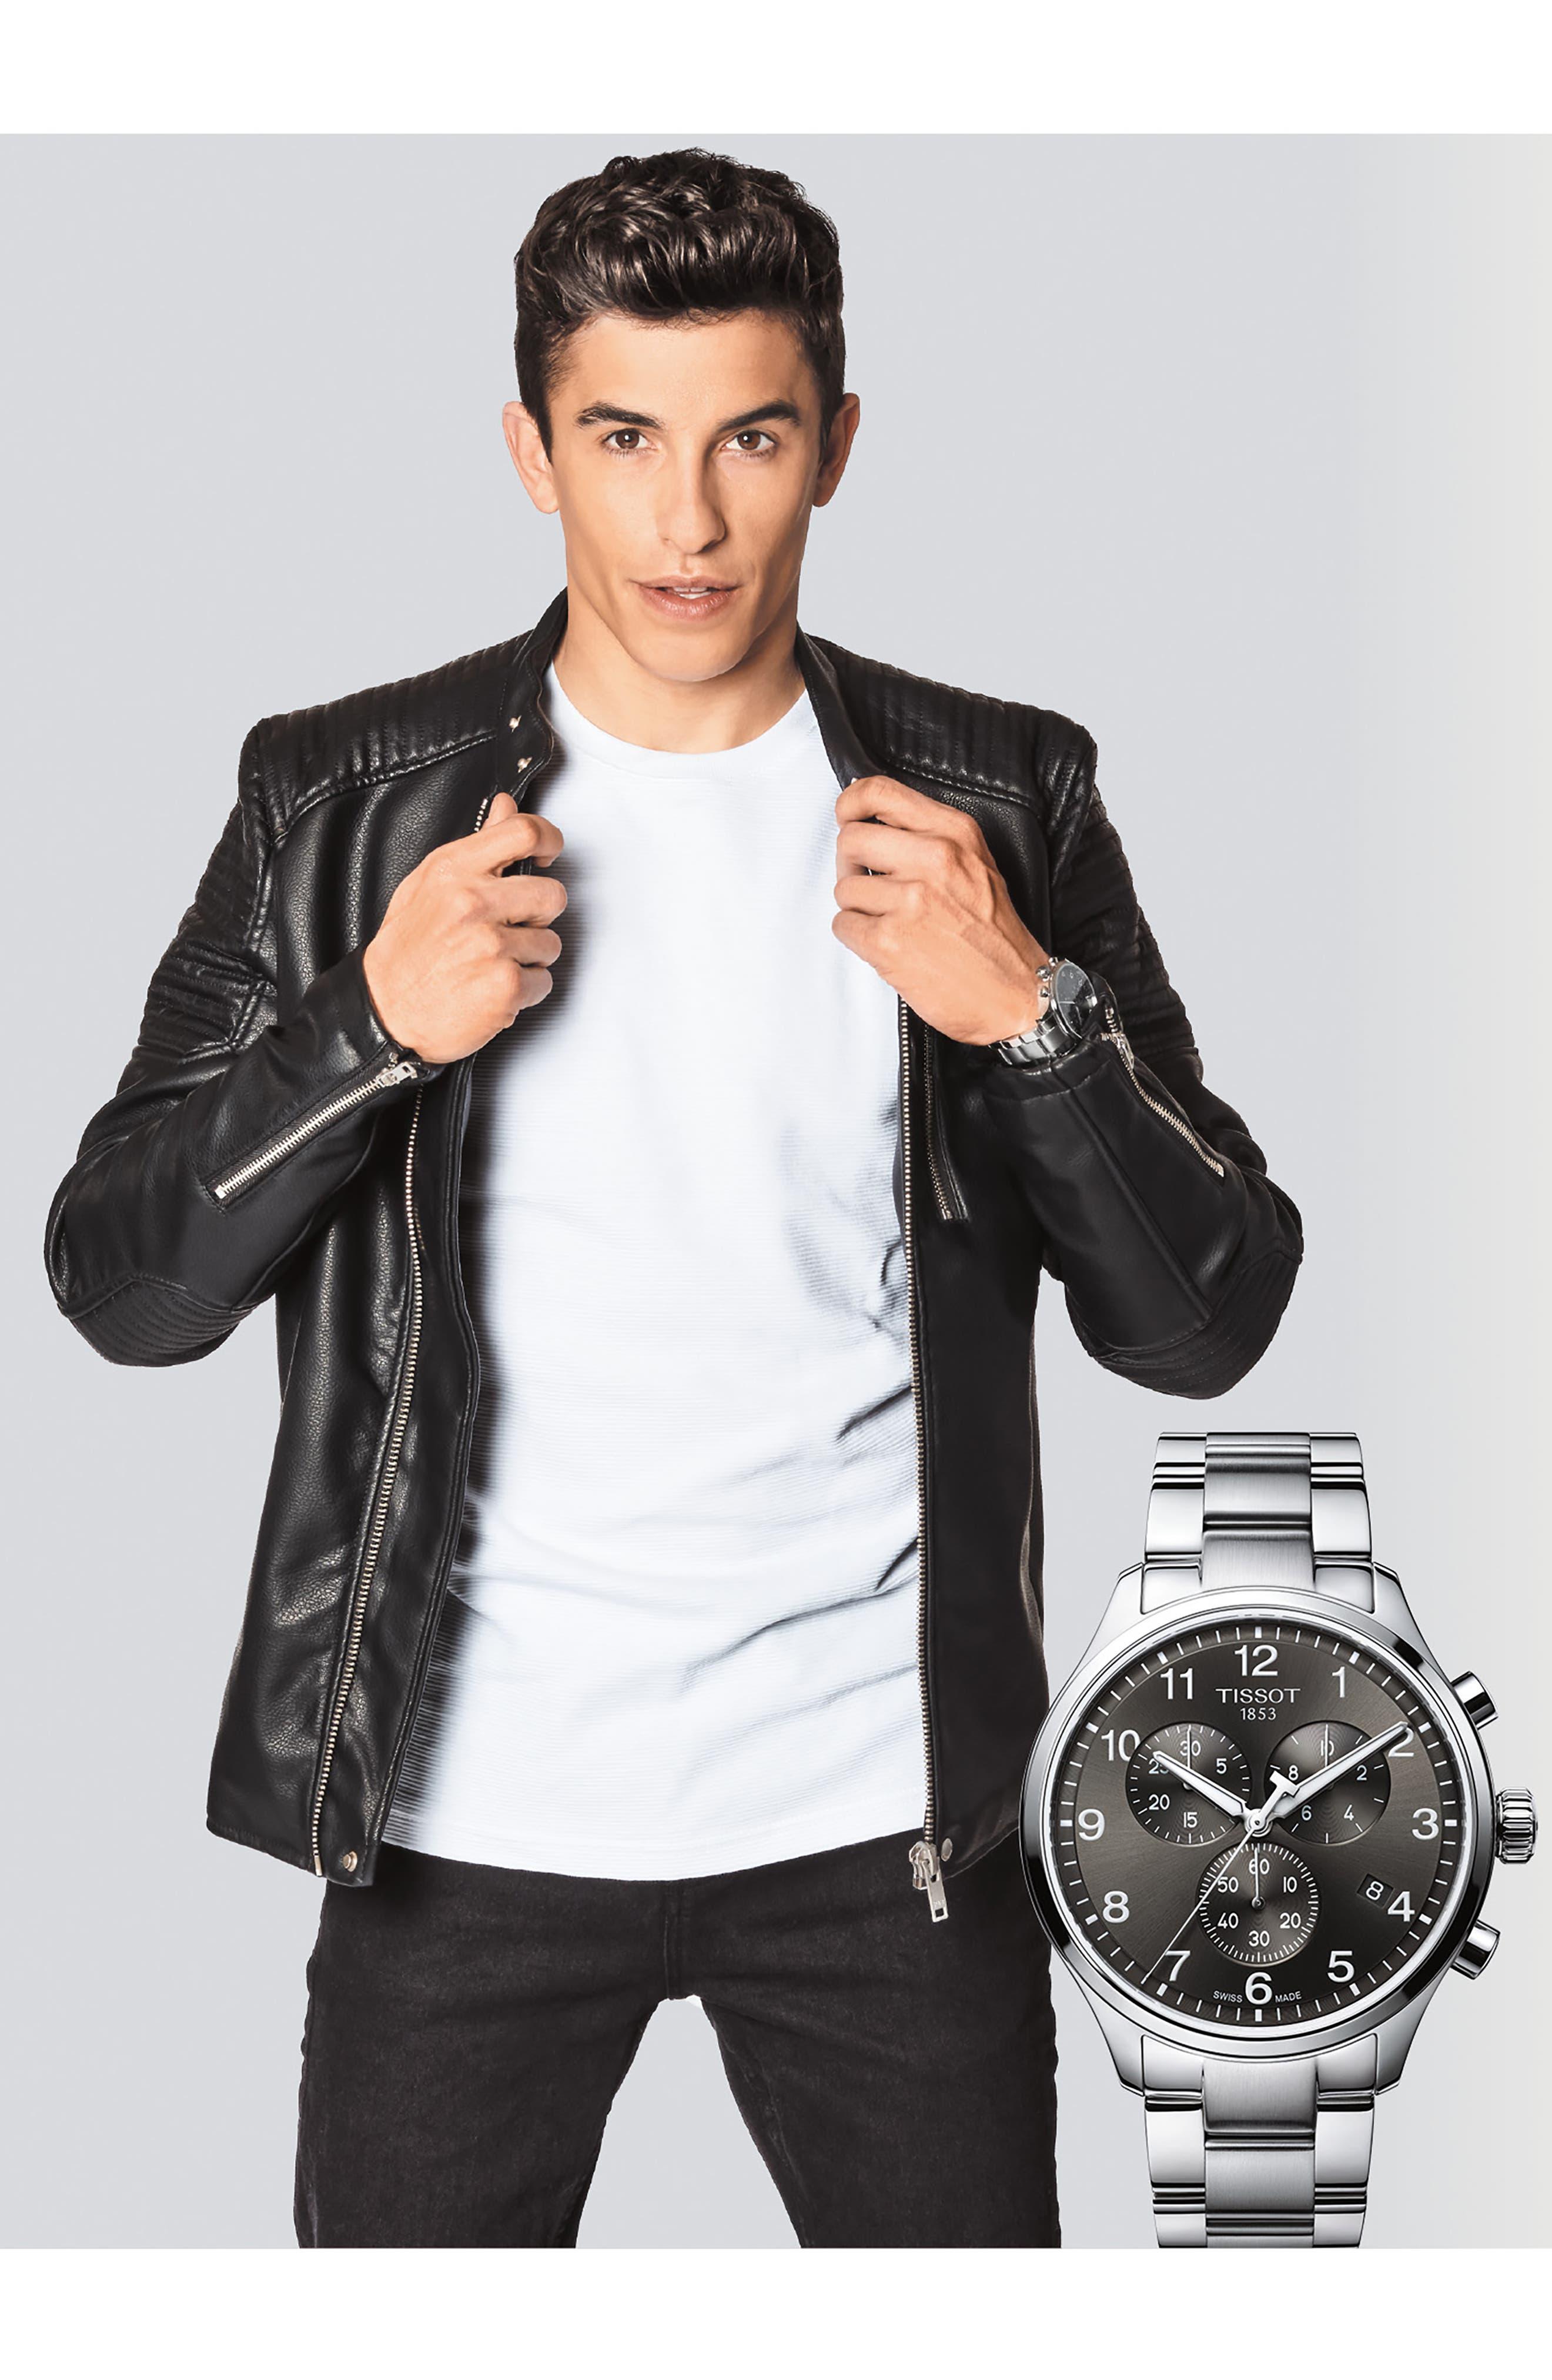 TISSOT, Chrono XL Collection Chronograph Bracelet Watch, 45mm, Alternate thumbnail 3, color, SILVER/ BLACK/ SILVER